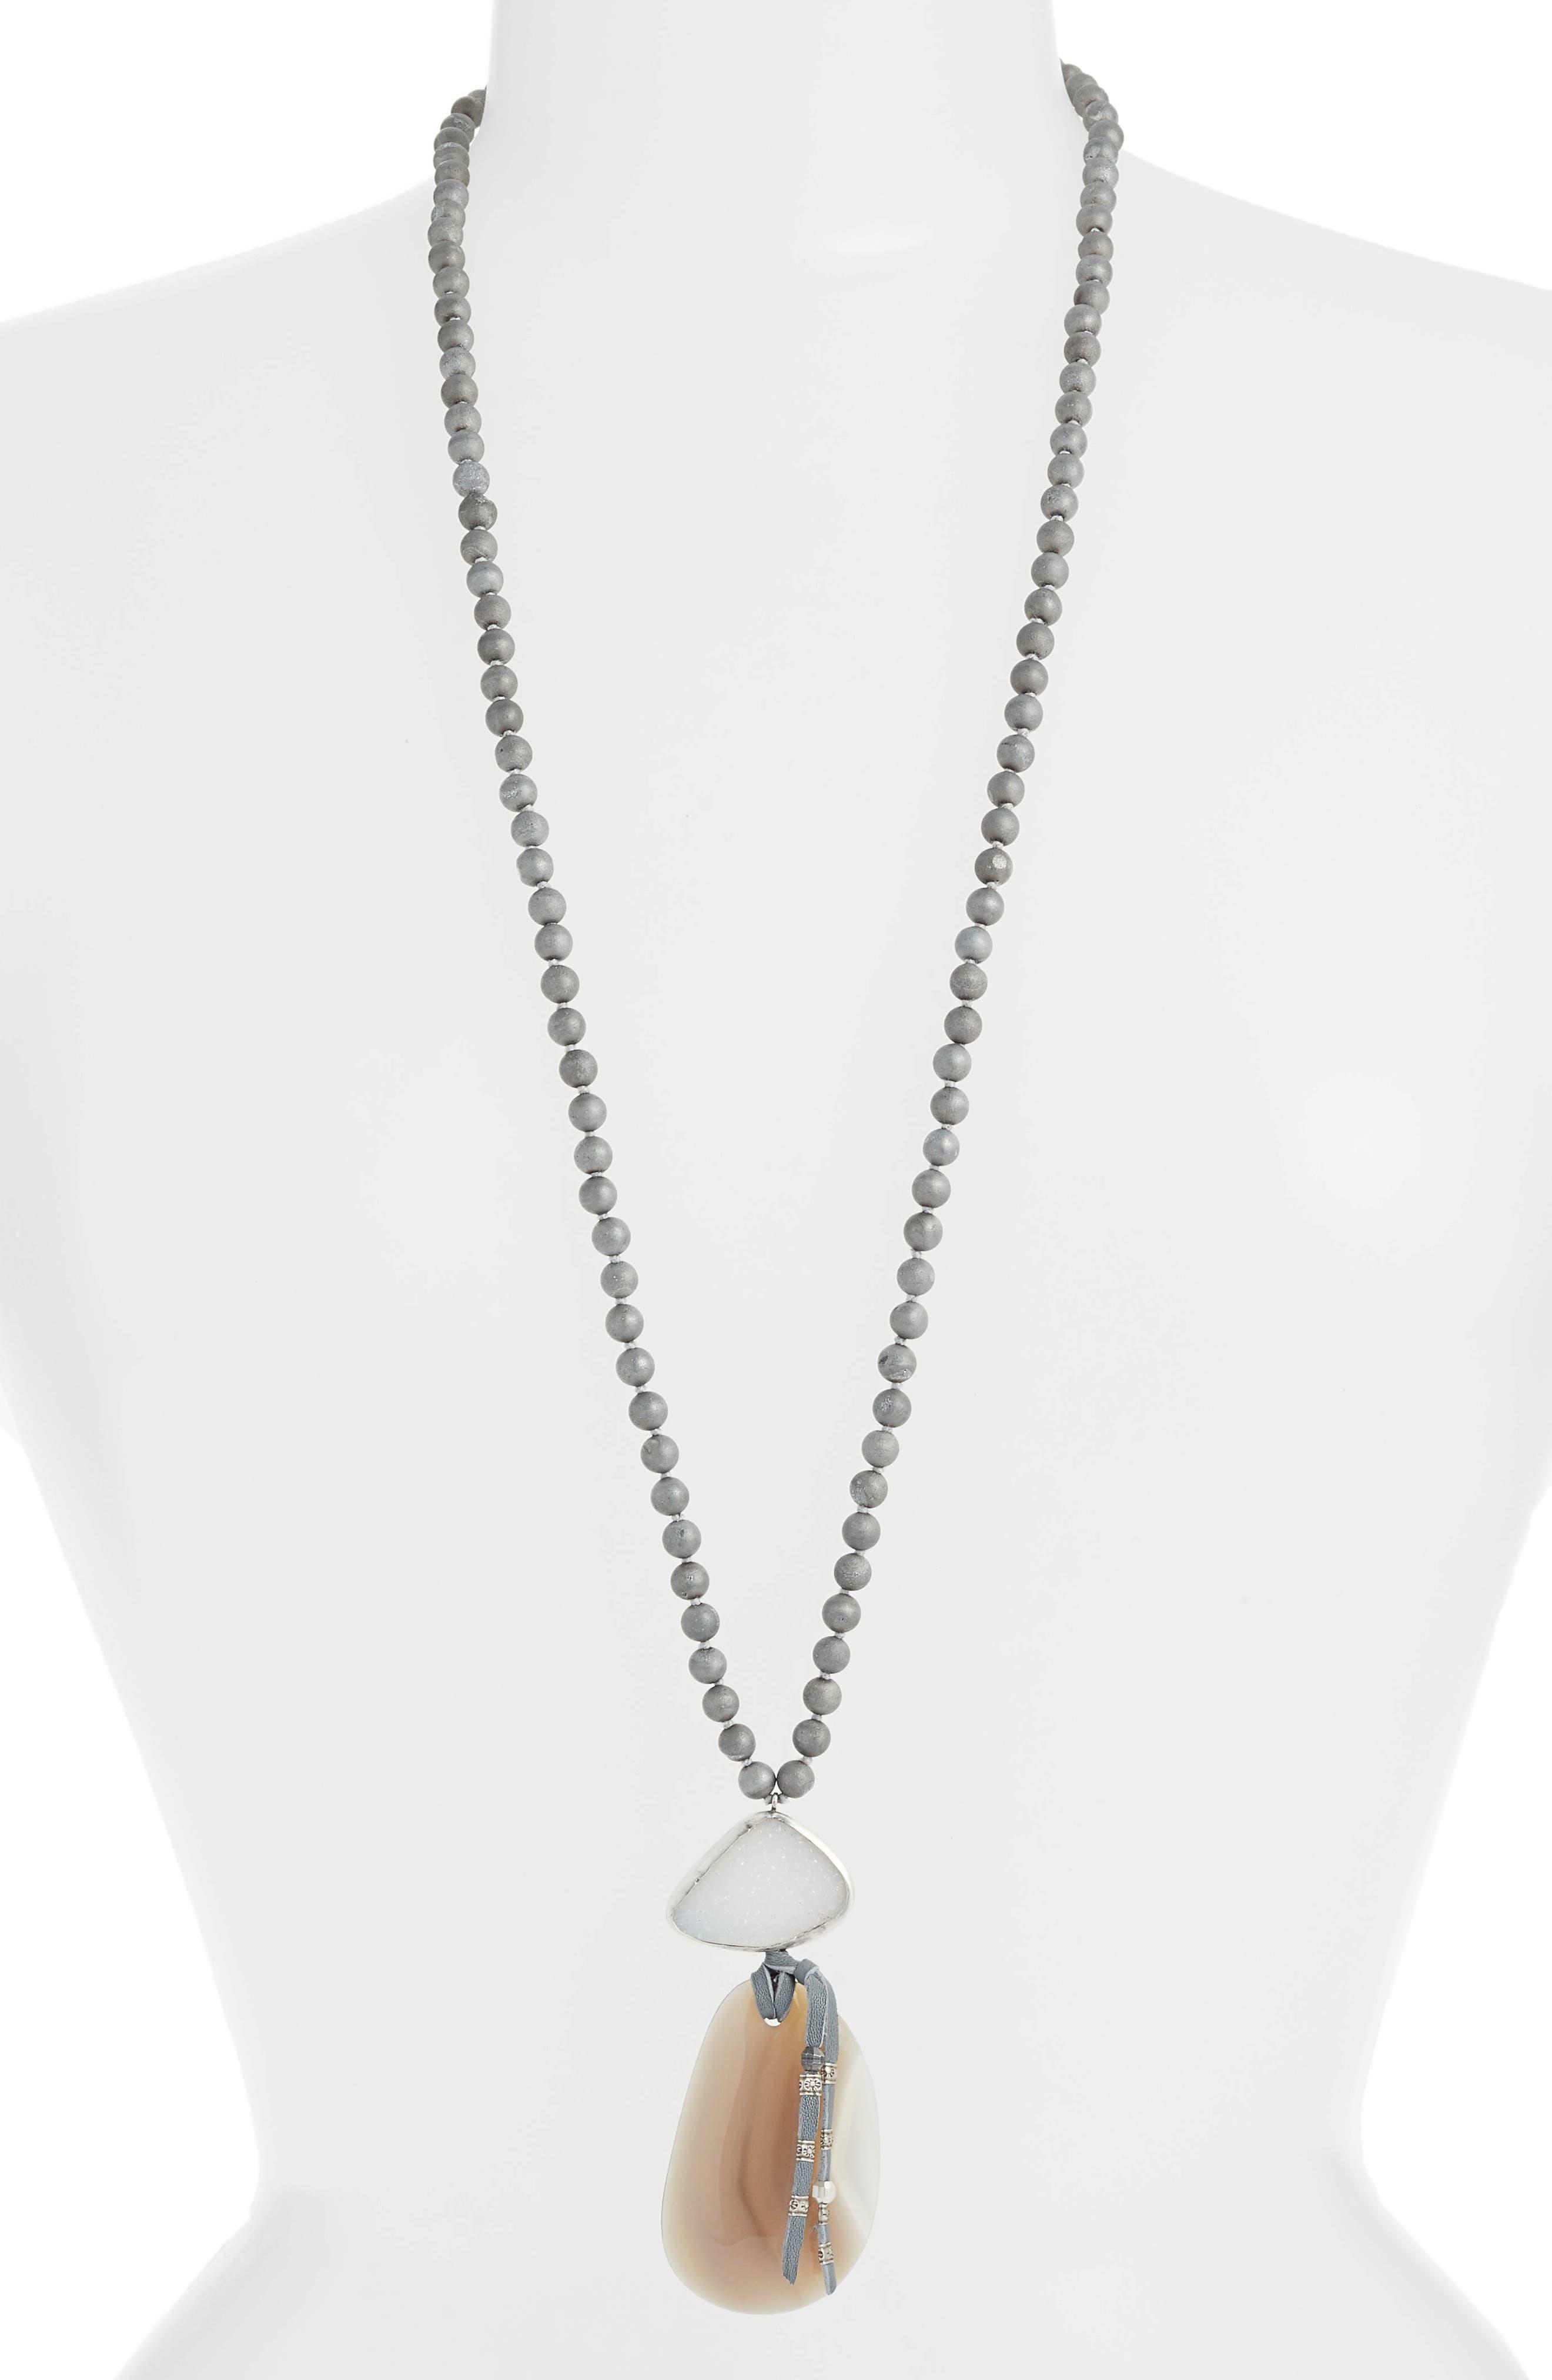 Silver Agate Statement Pendant Necklace,                             Main thumbnail 1, color,                             SILVER AGATE